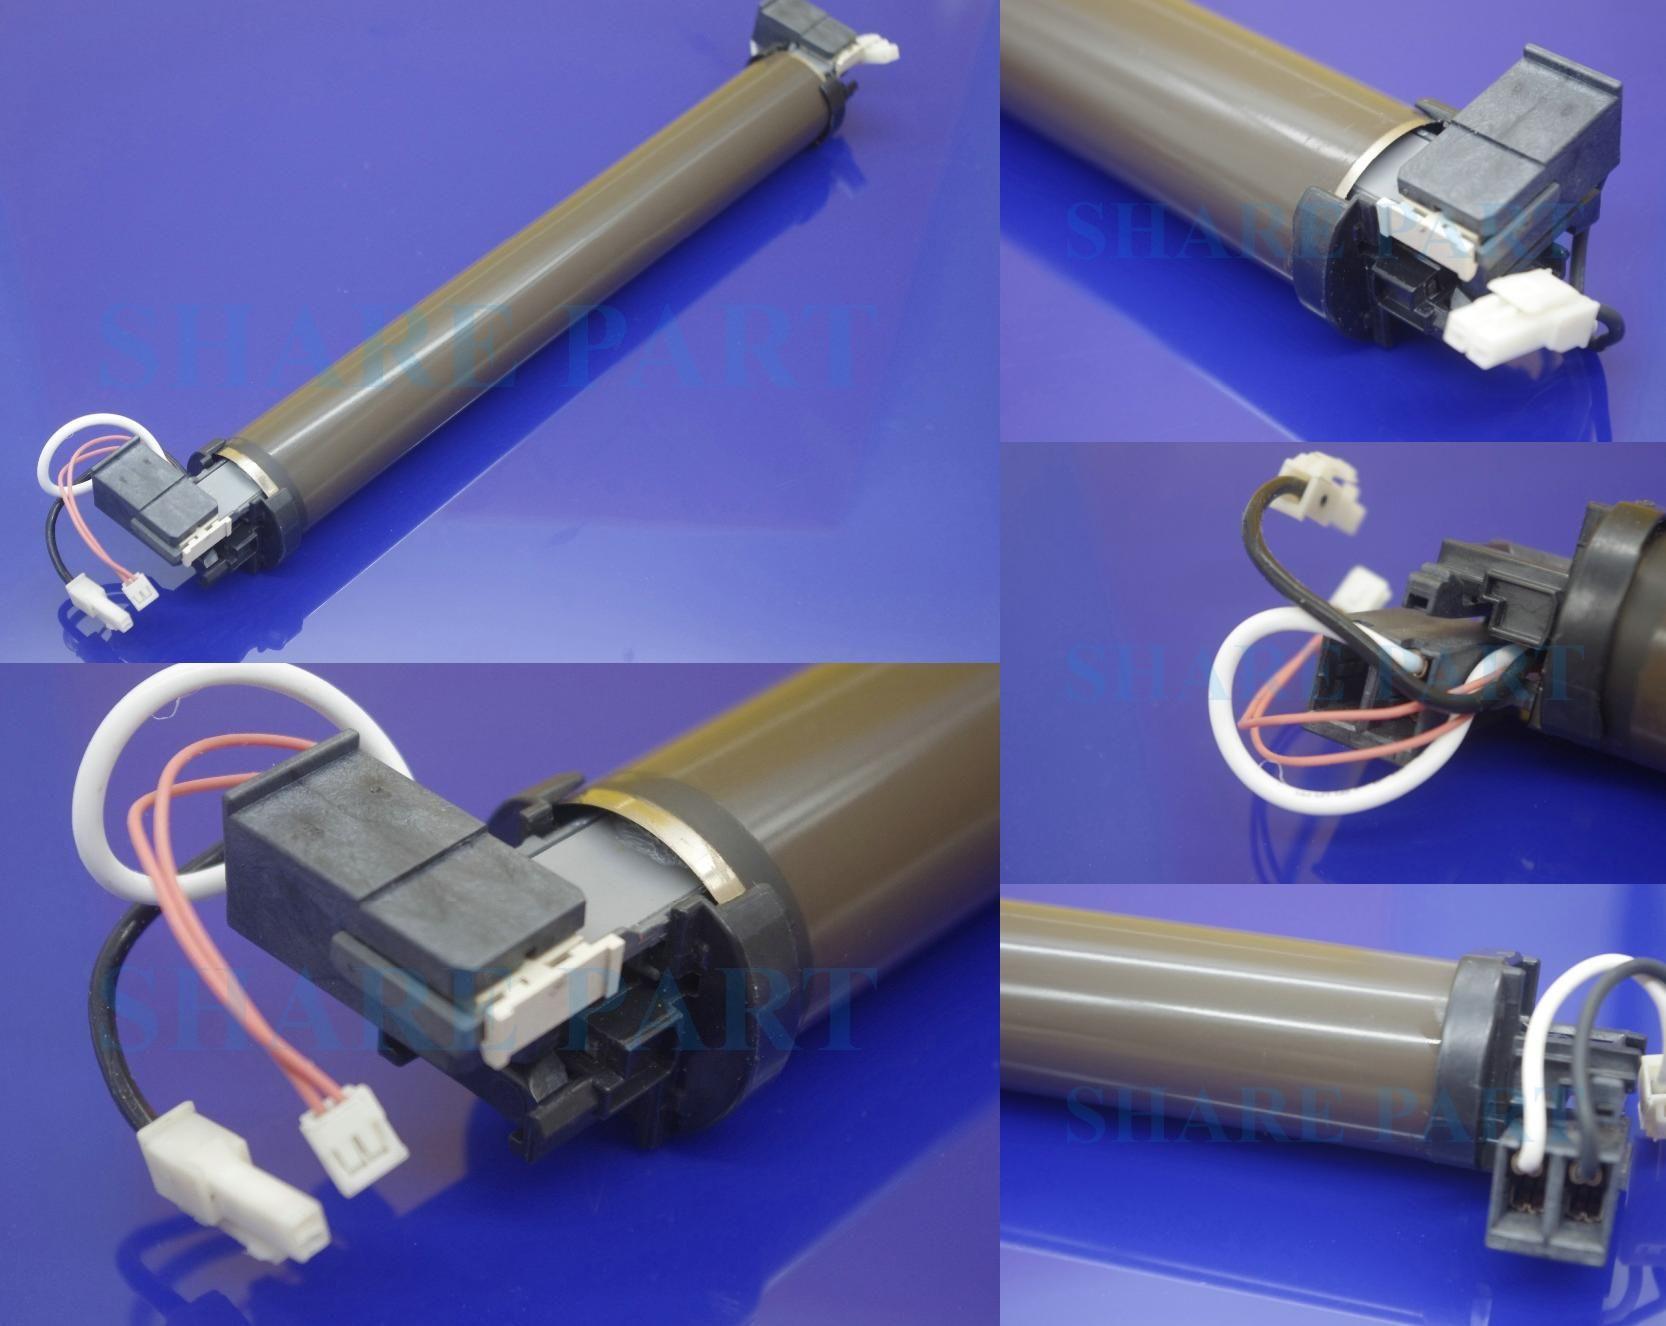 [Visit to Buy] 1X new fuser film unit 220V RM1 1083